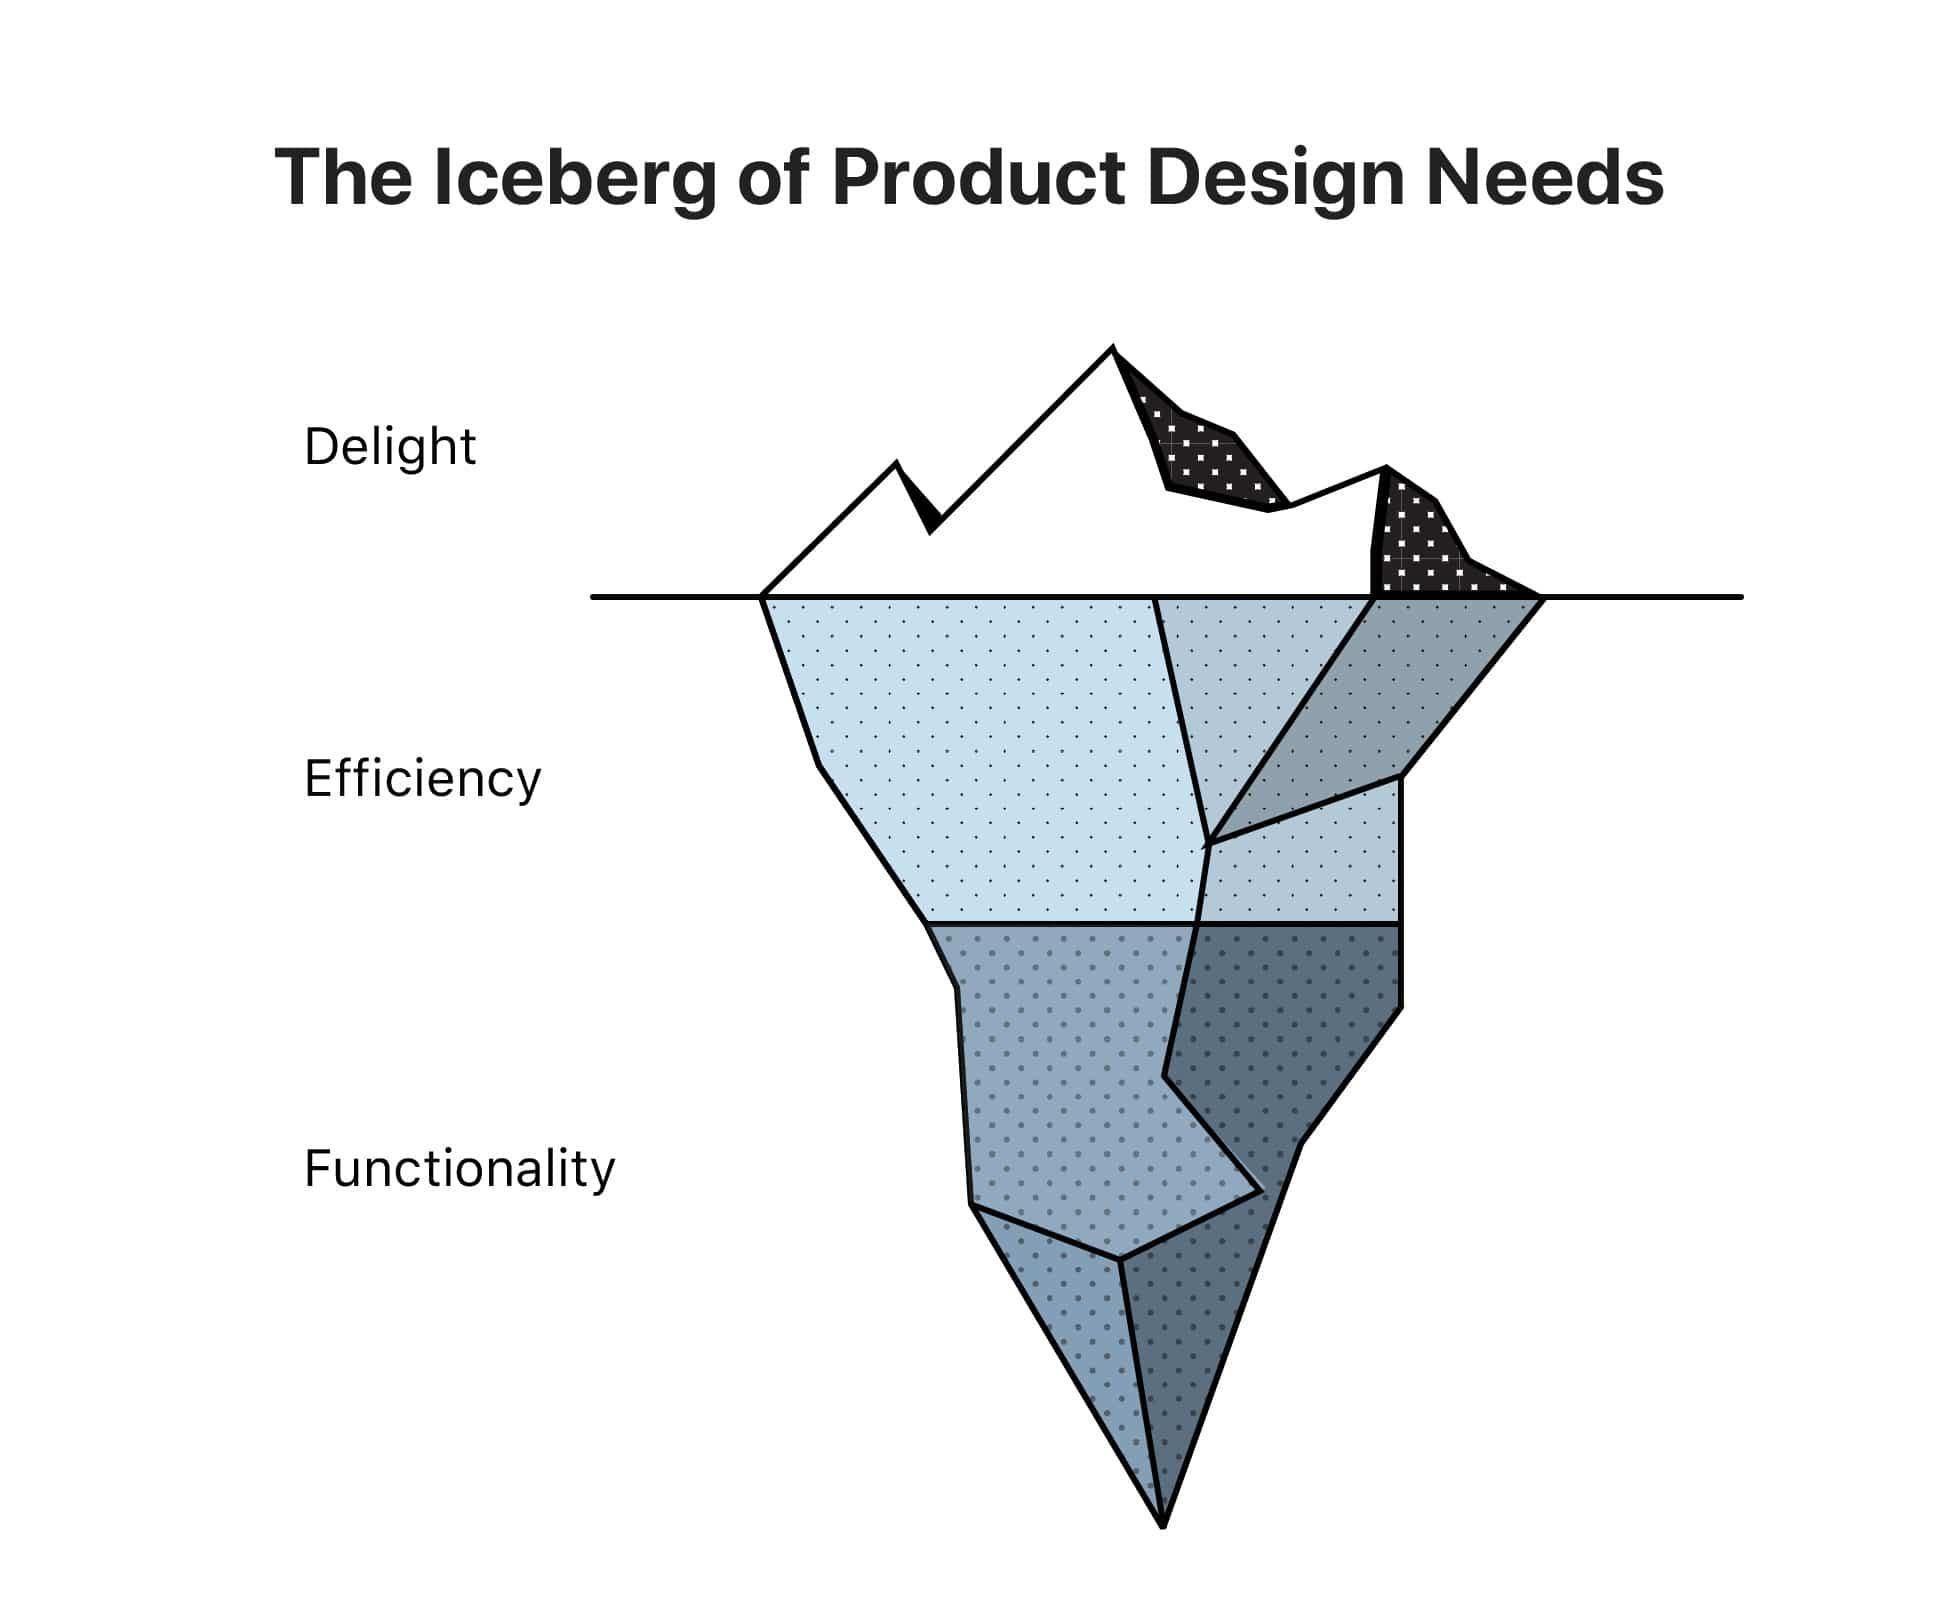 The Iceberg of Product Design Needs